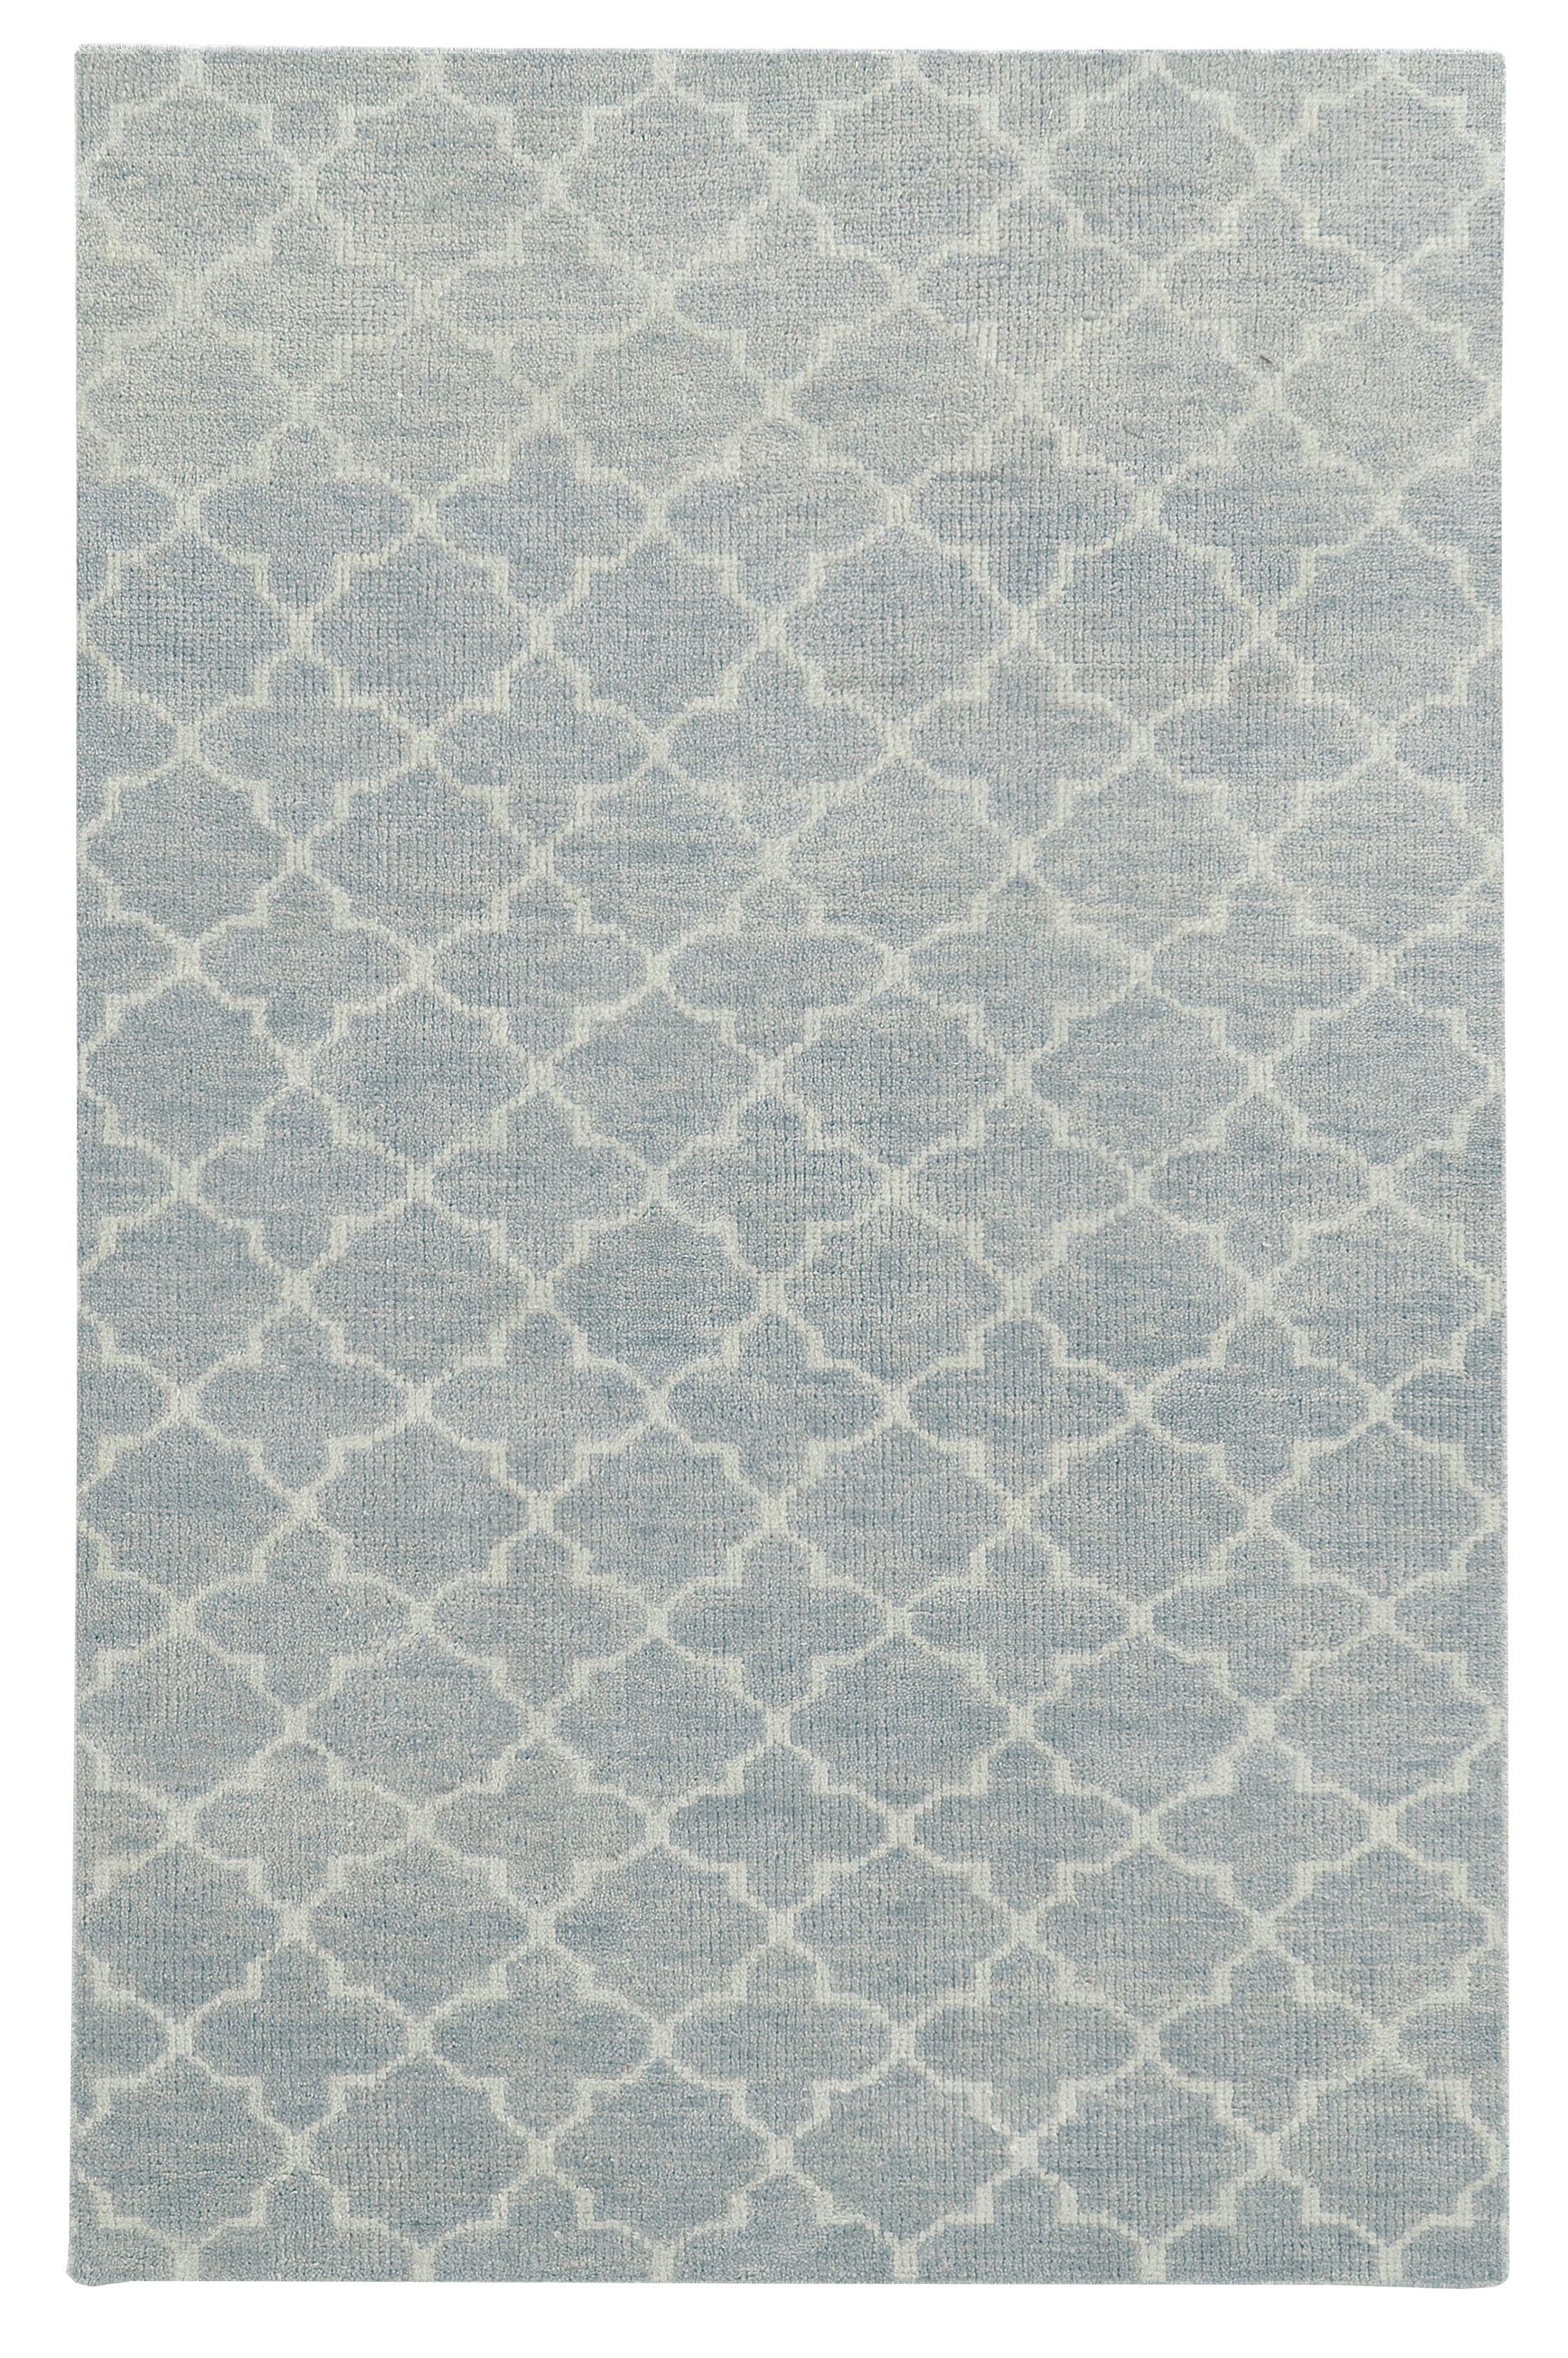 Tommy Bahama Maddox Blue / Beige Geometric Rug Rug Size: Rectangle 5' x 8'